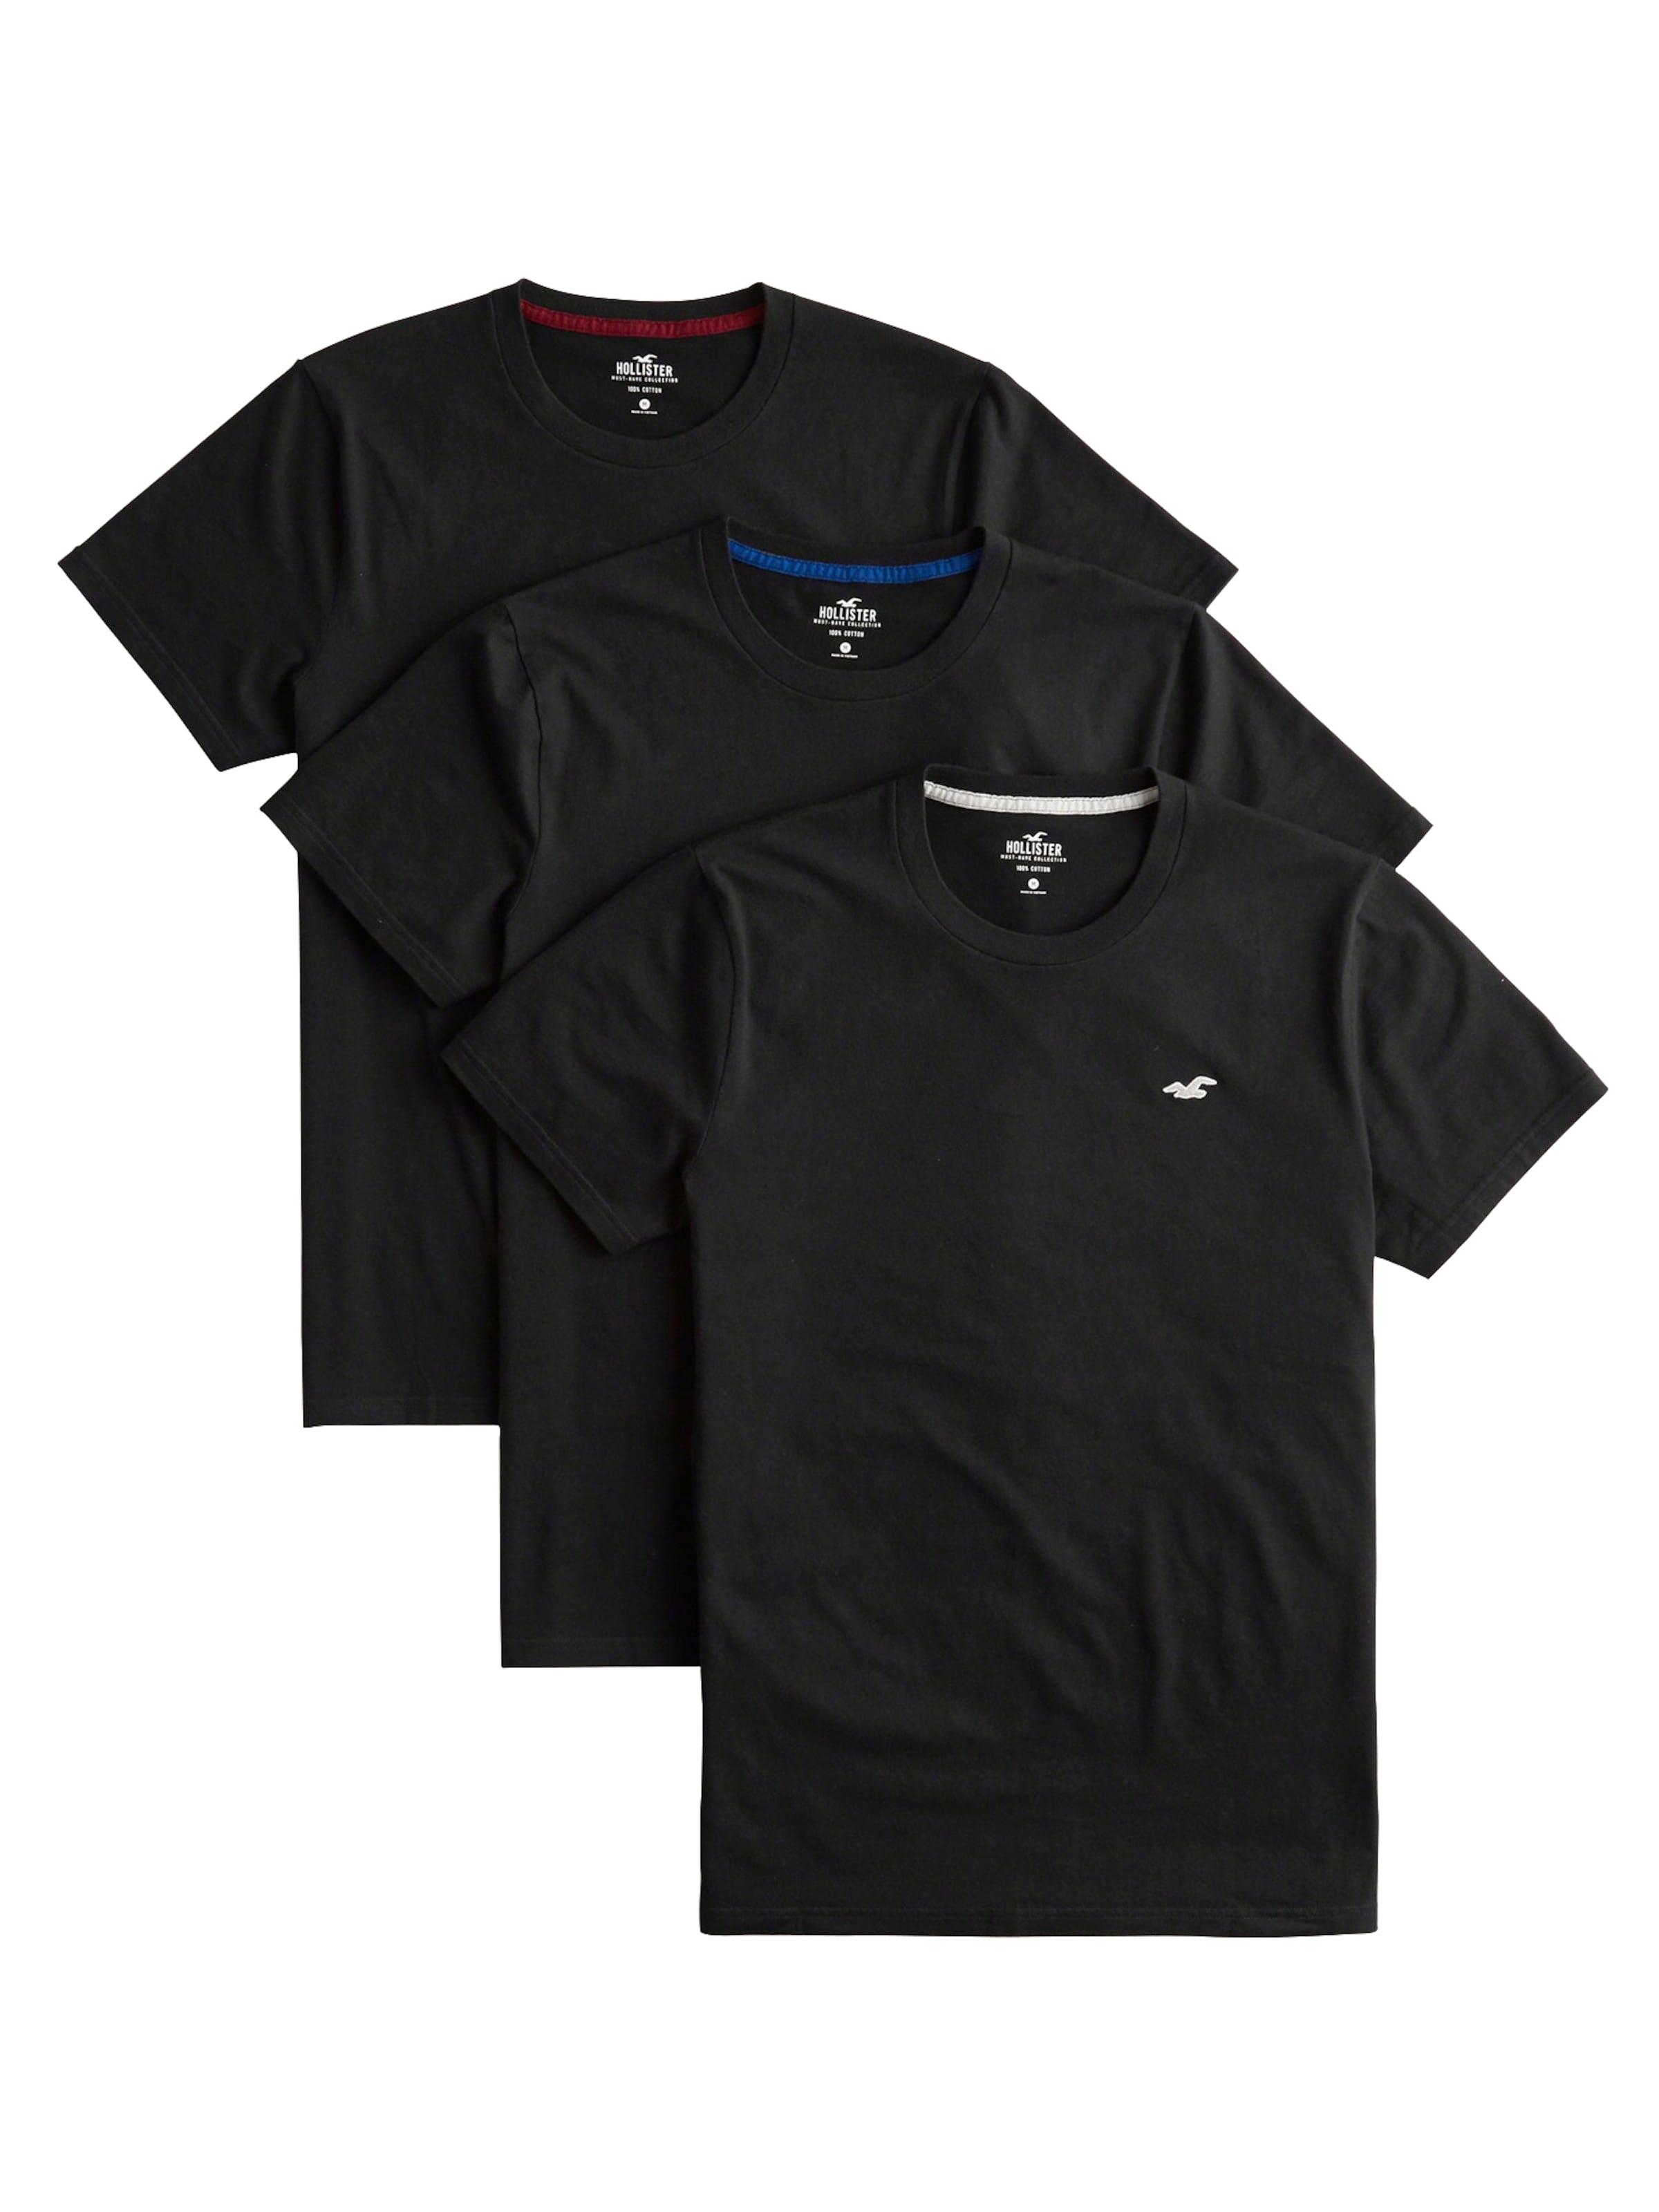 Multipack' T Black shirt En Crew 'dtc Noir Hollister roCWdBex